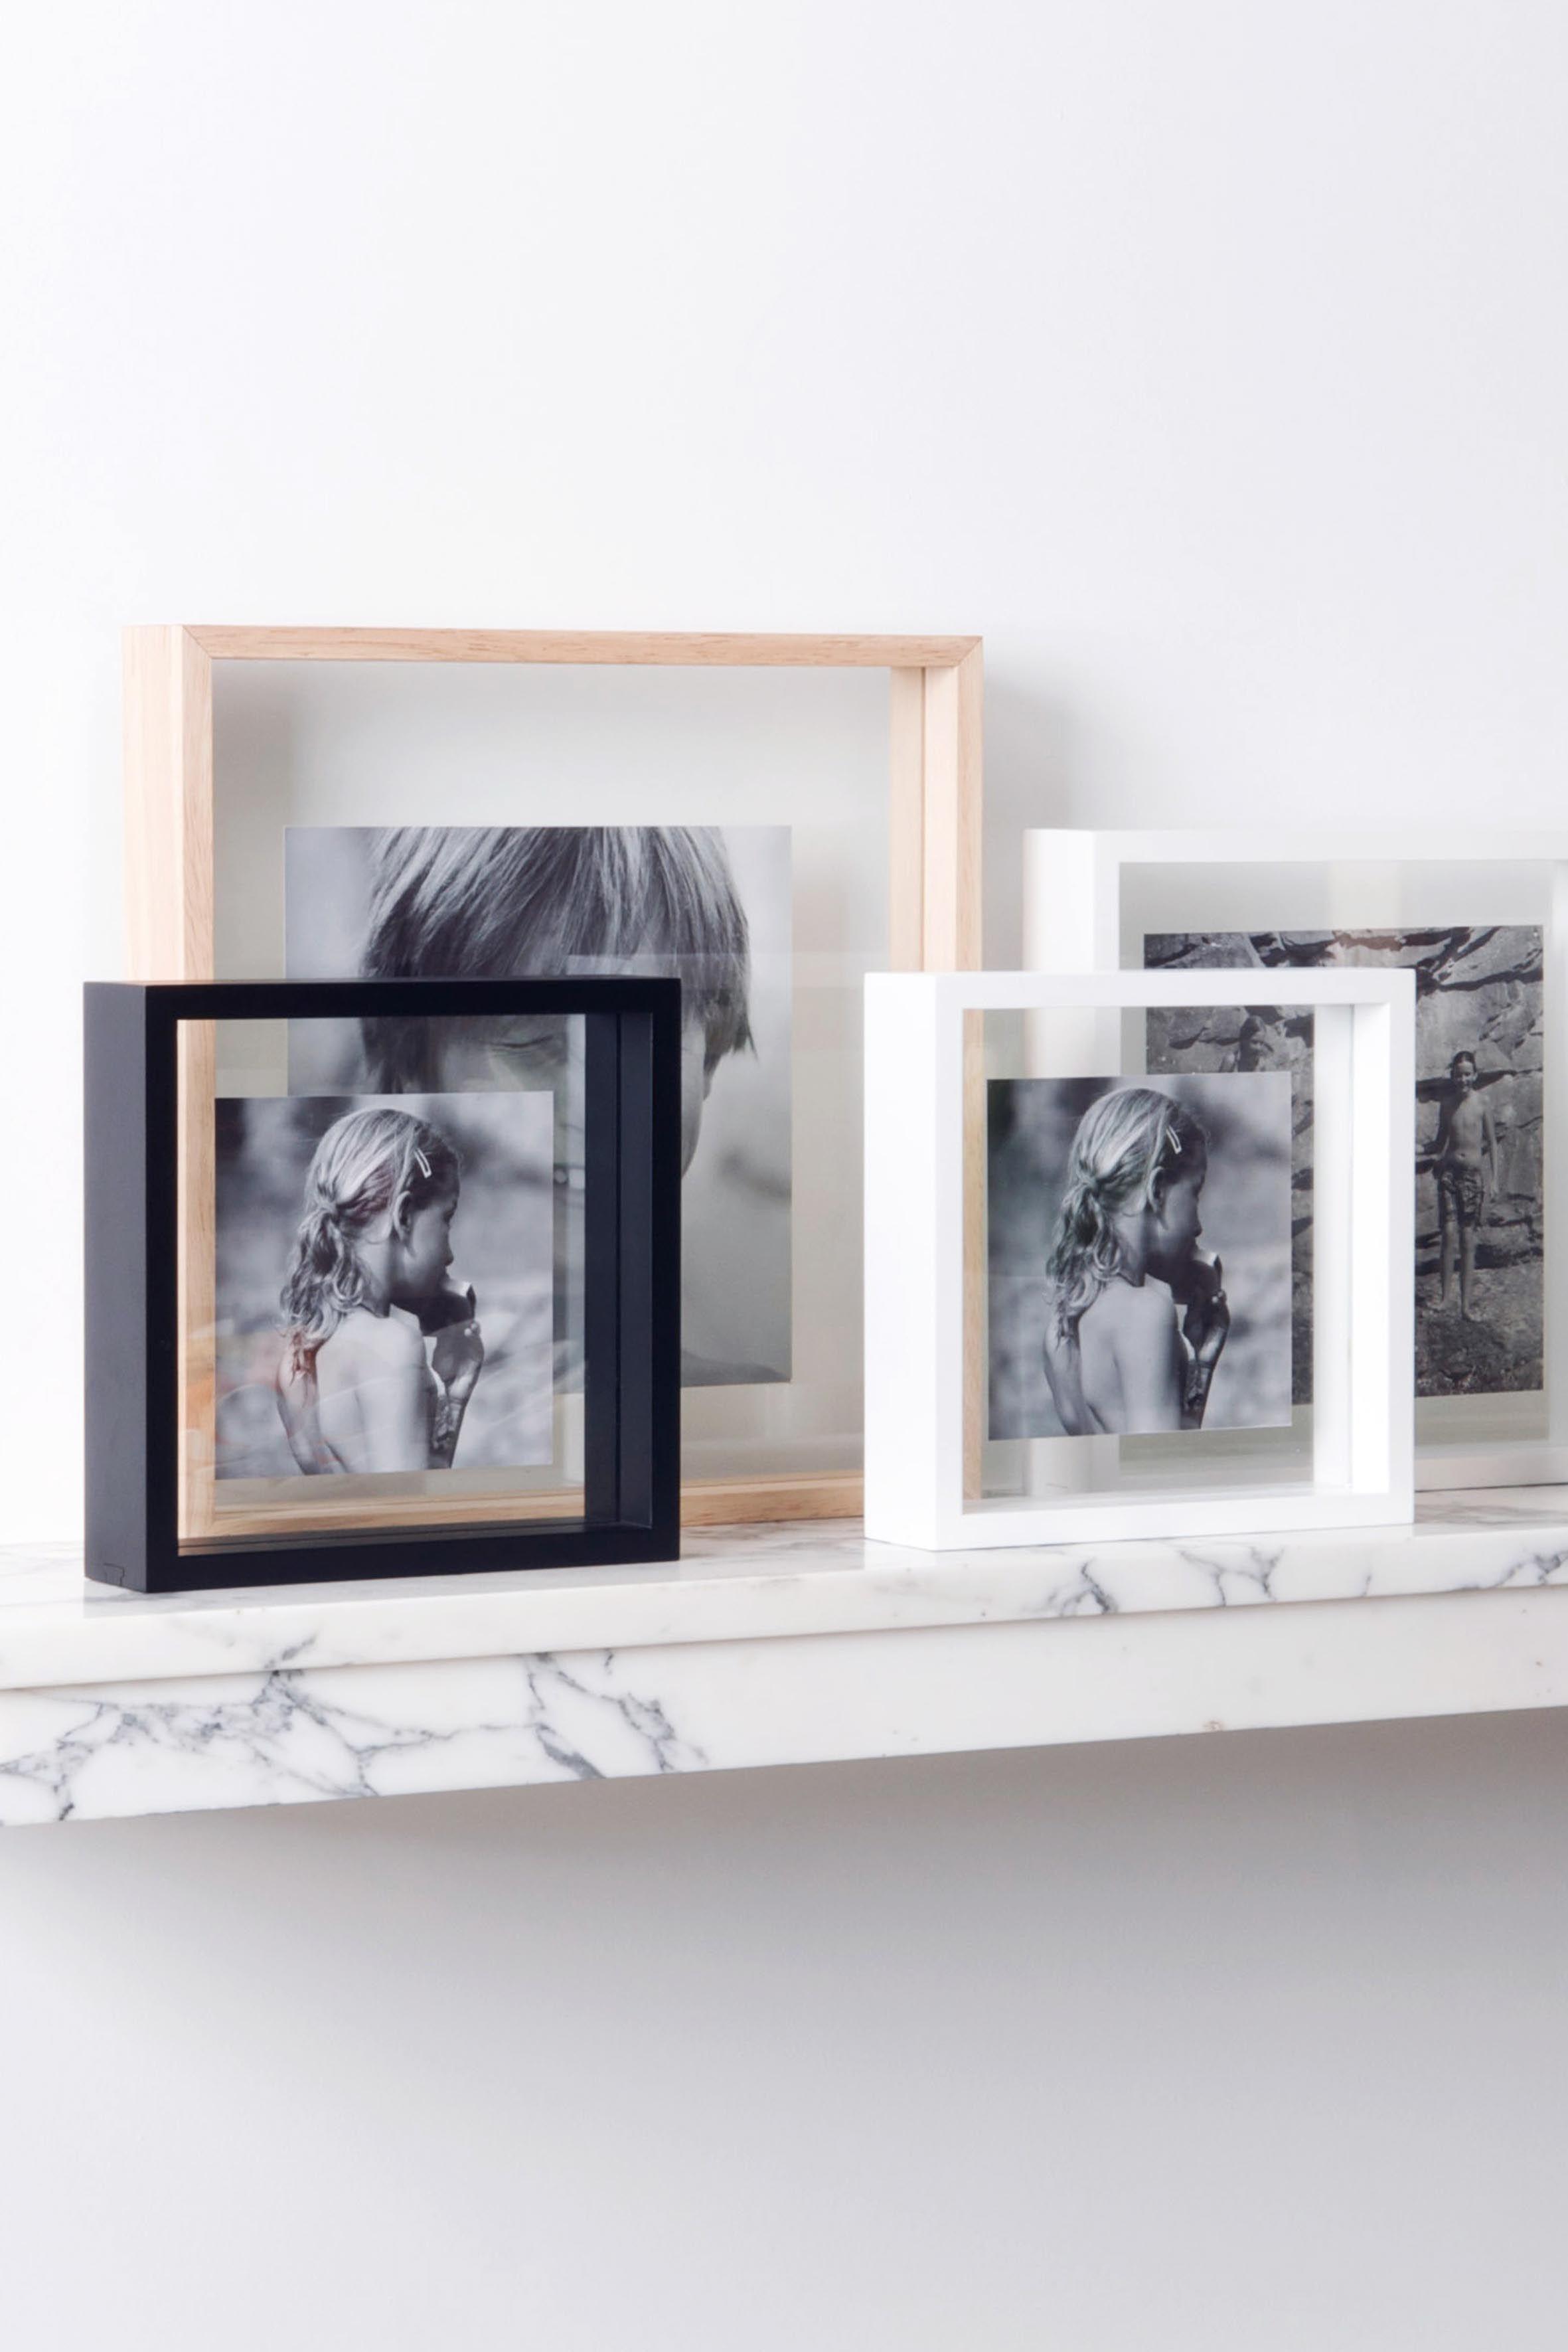 The Floating Boxes by XLBoom | XLBoom Frames | Pinterest | Box ...